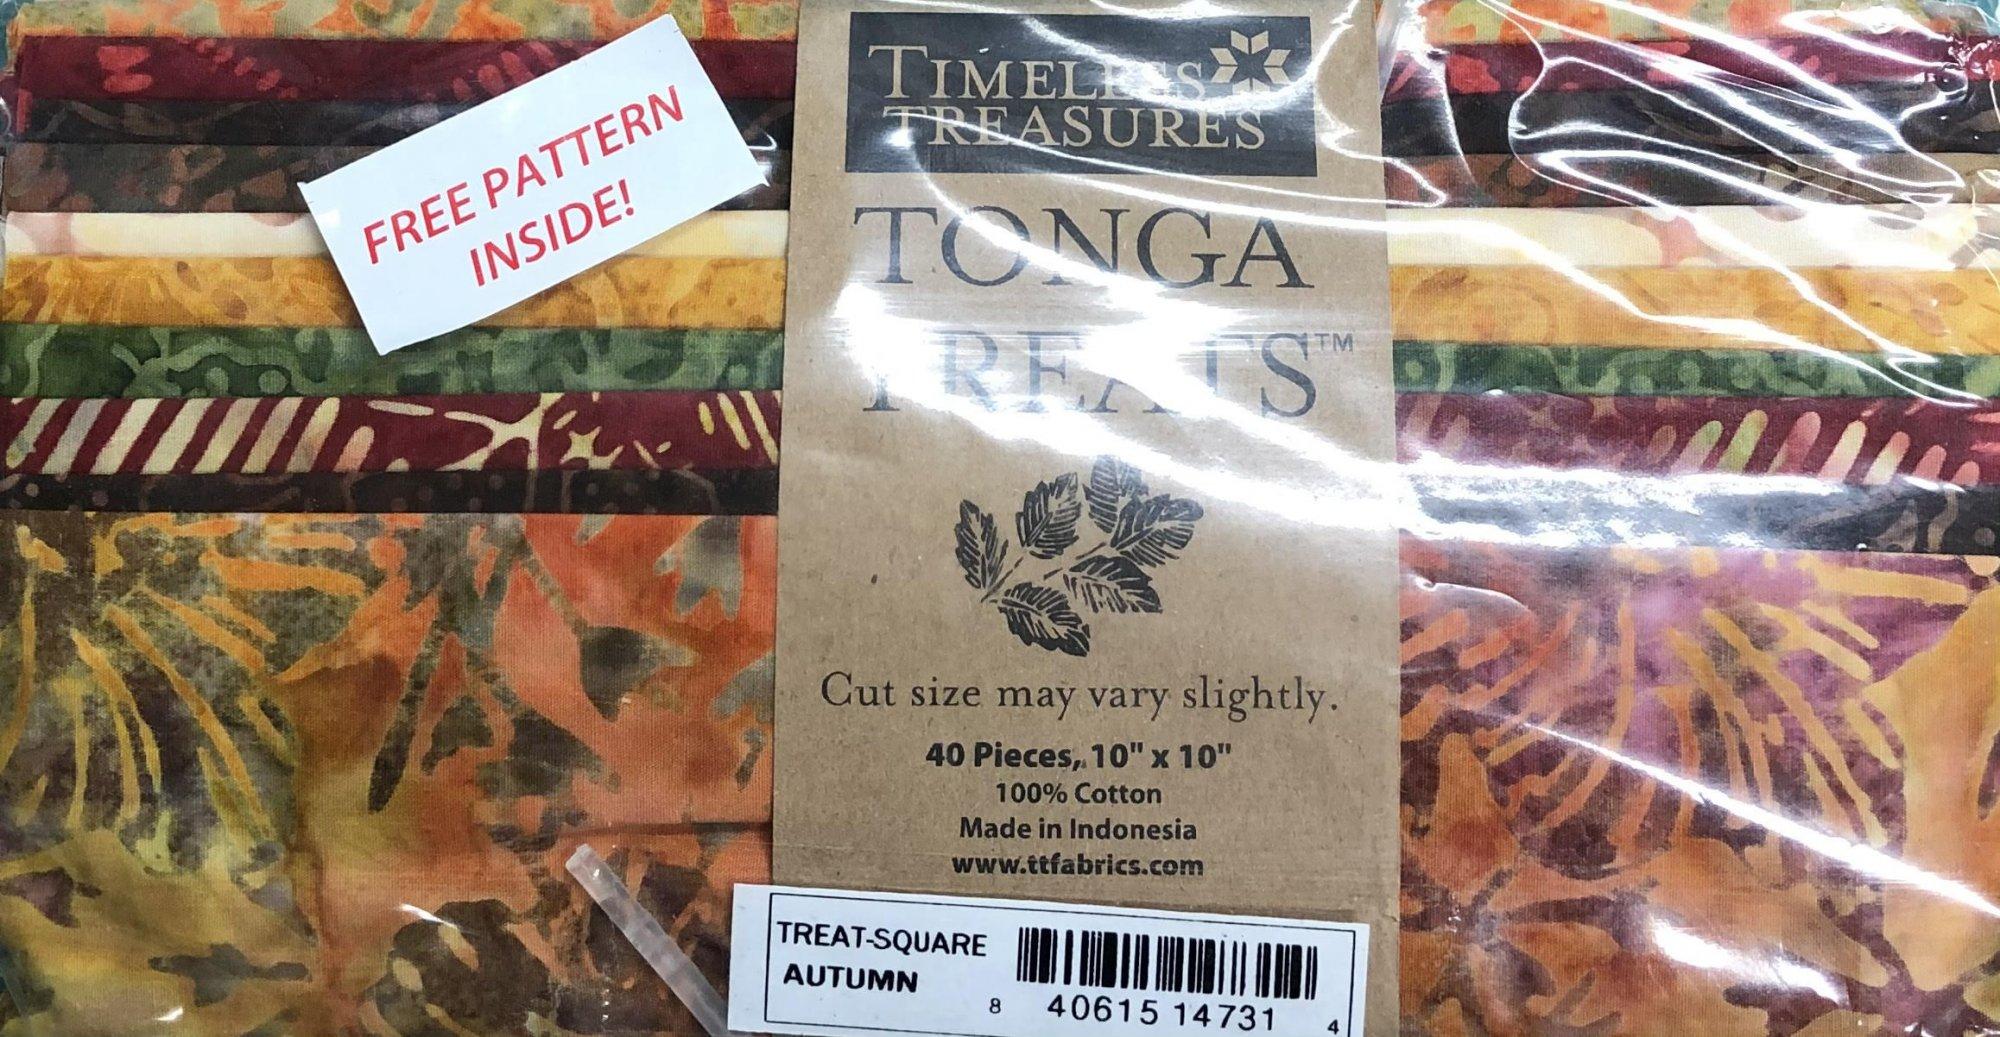 Tonga Layercake - Autumn